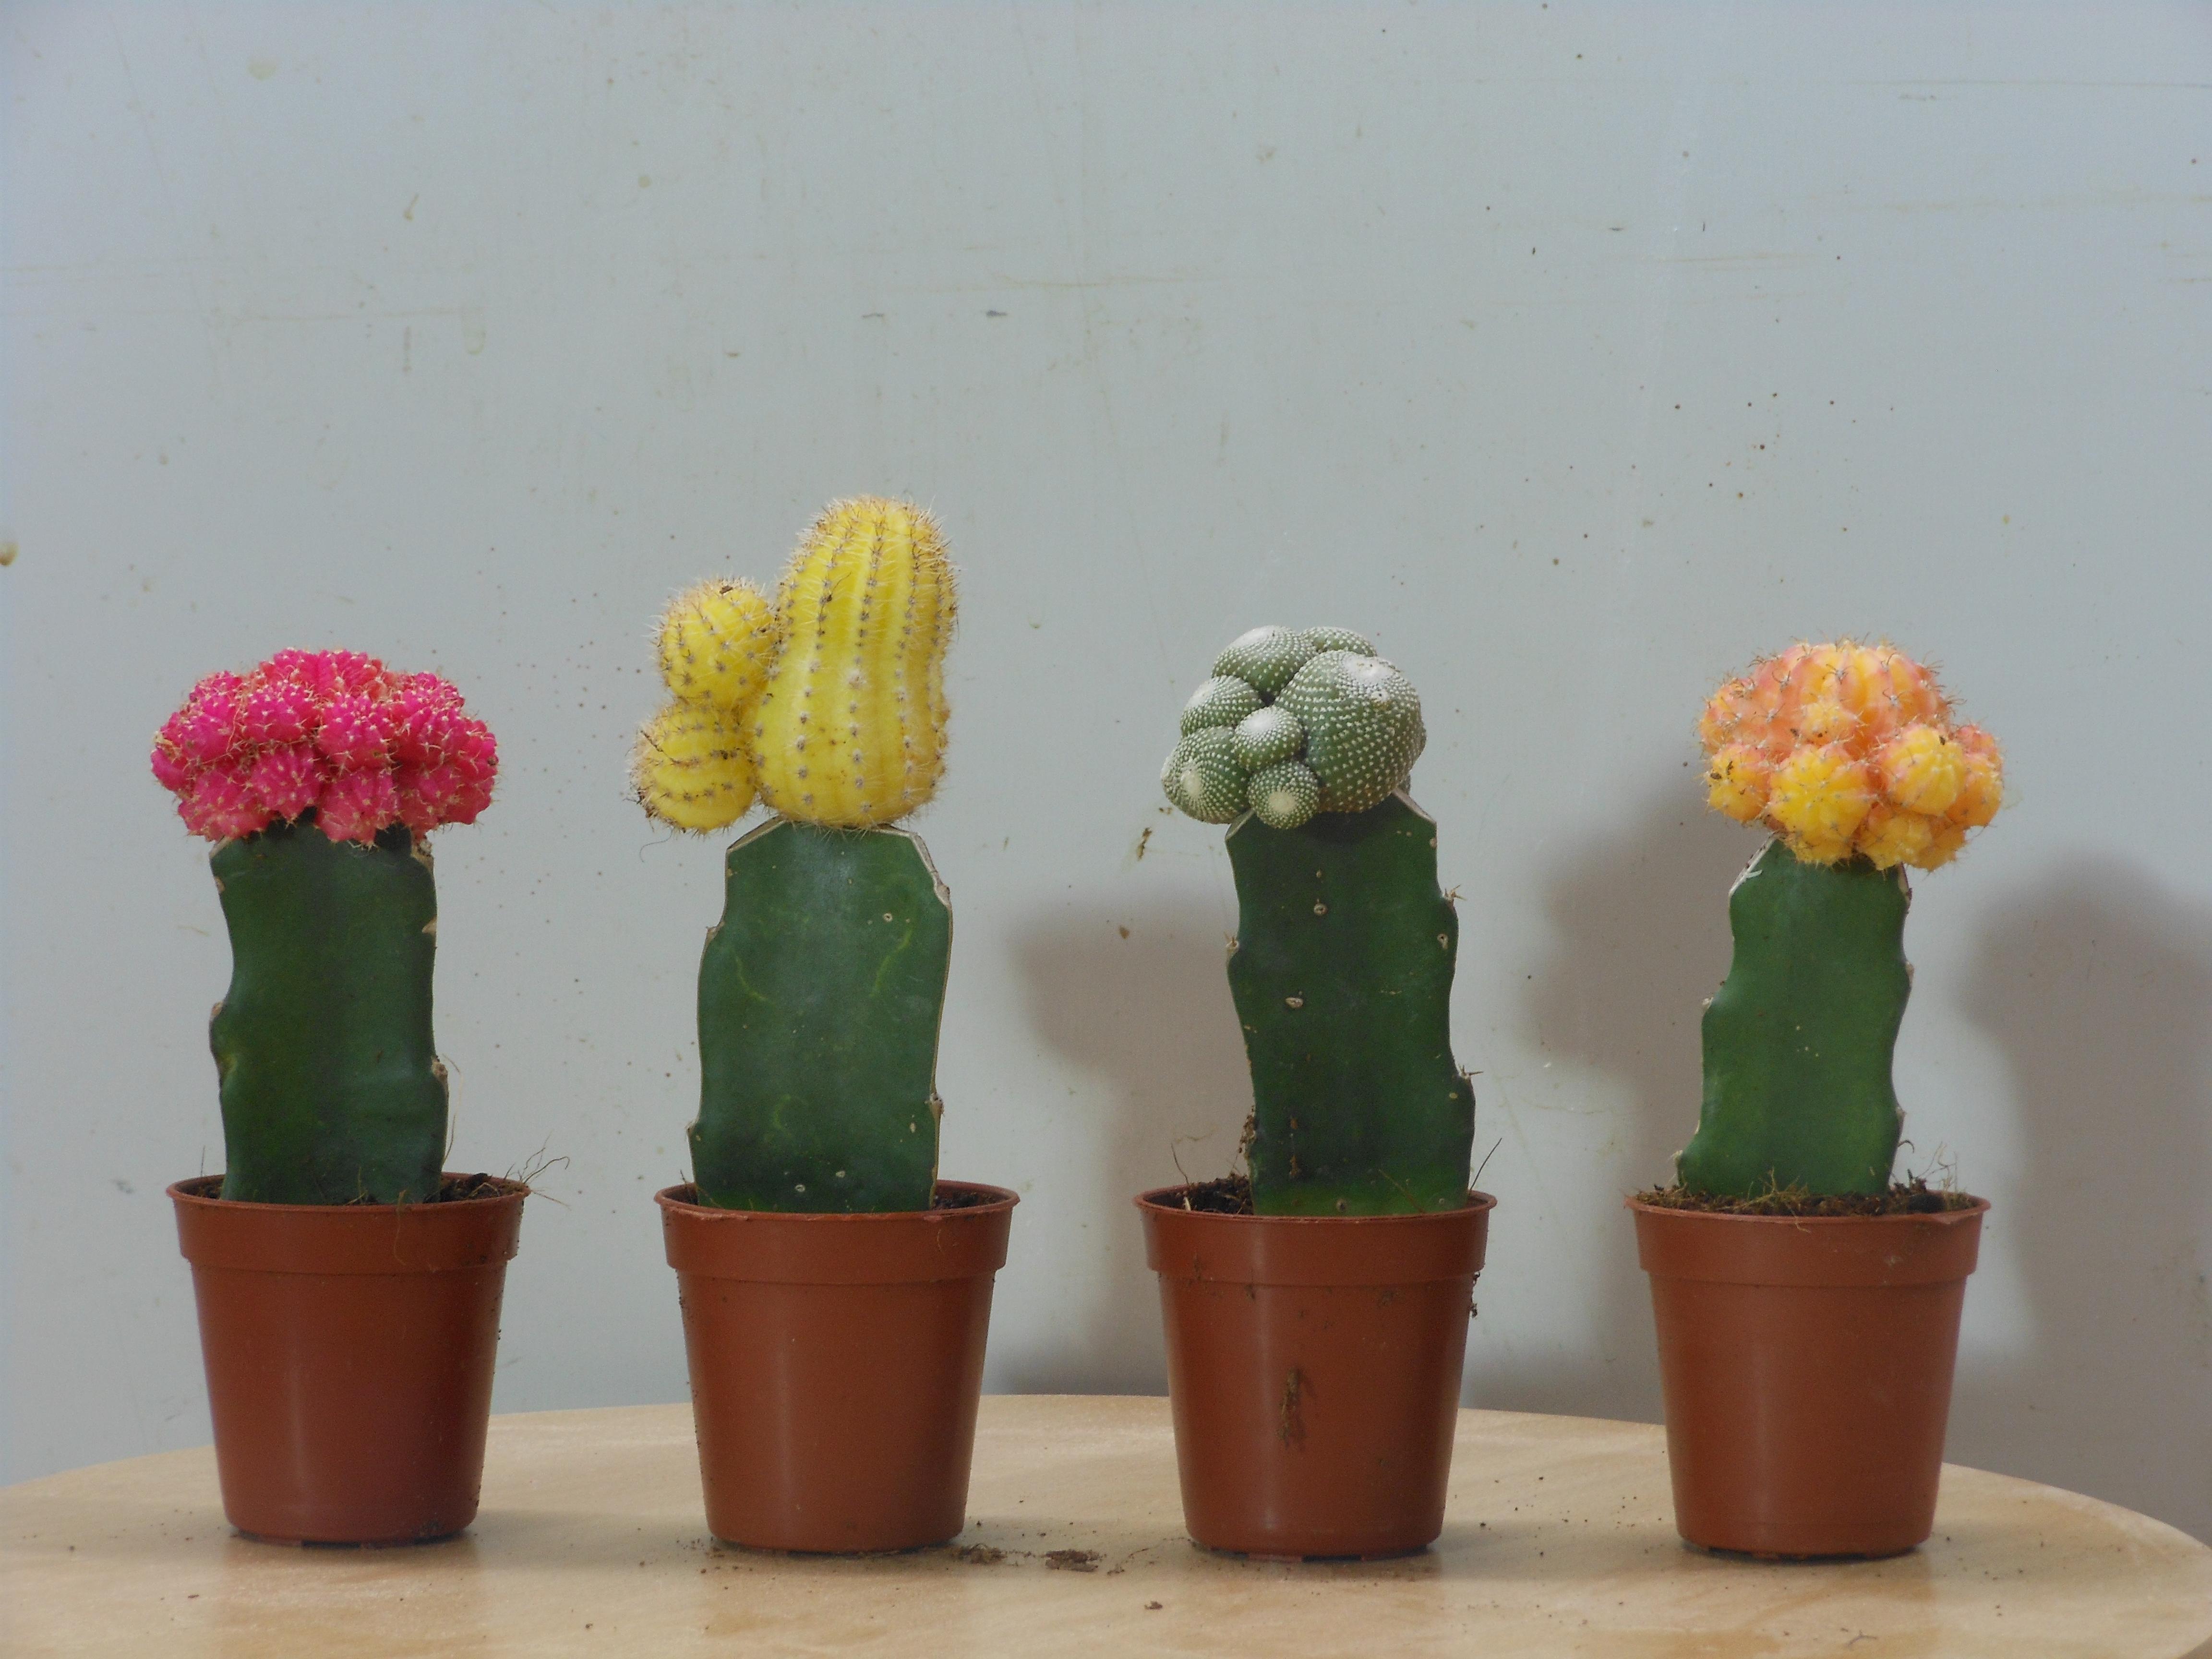 File cactus wikimedia commons - Plantas para decorar interiores ...